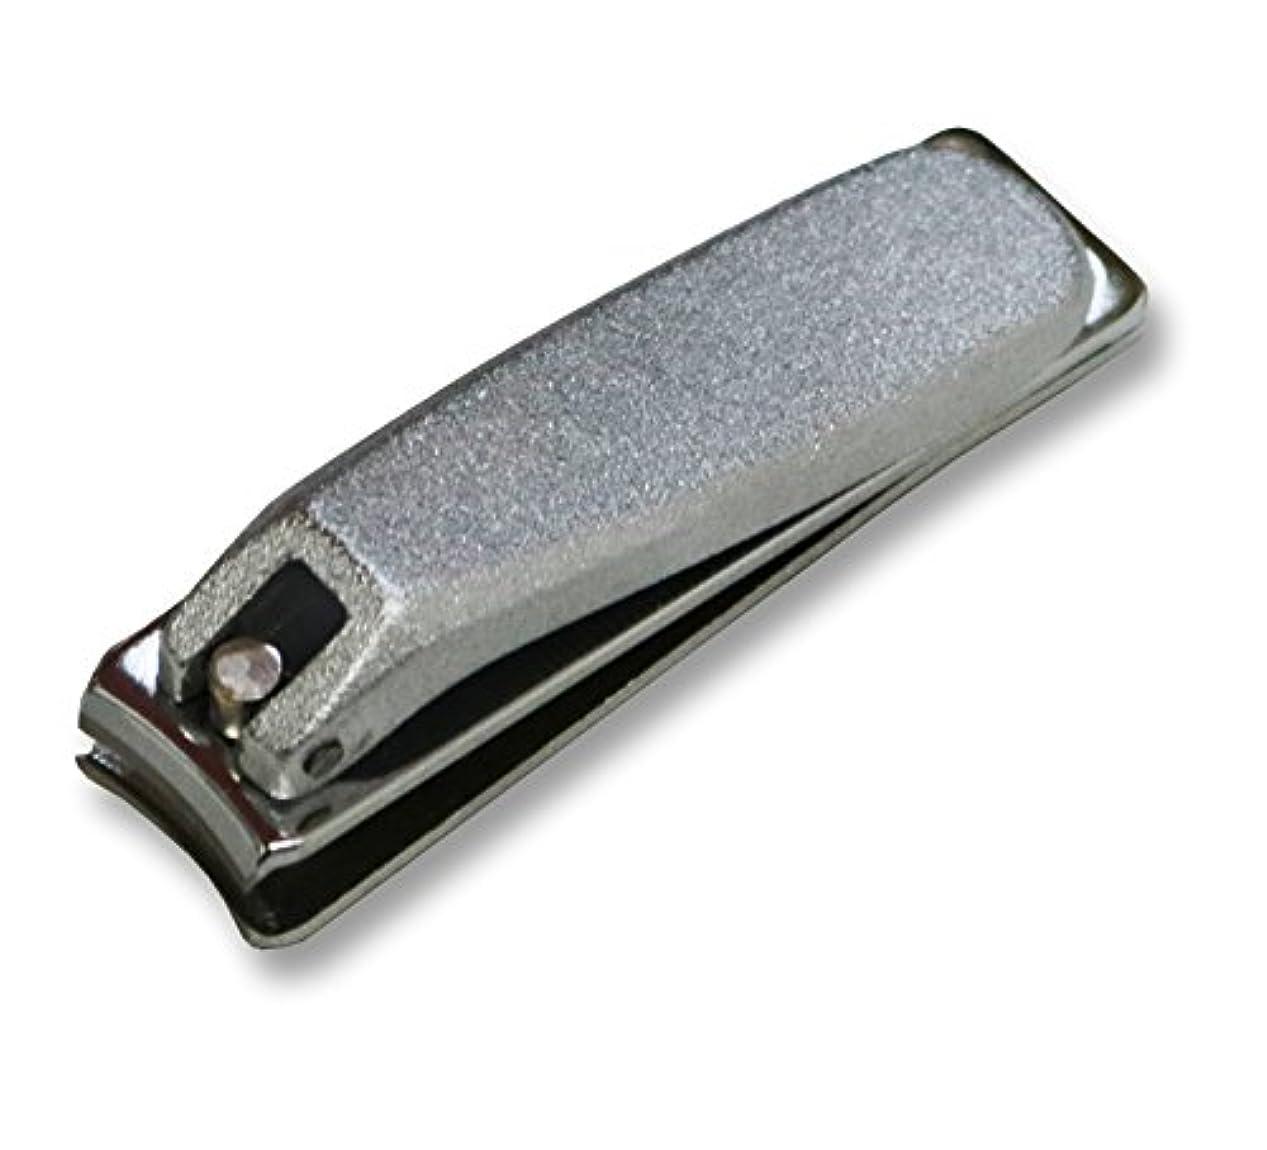 KD-023 関の刃物 クローム爪切 小 カバー無